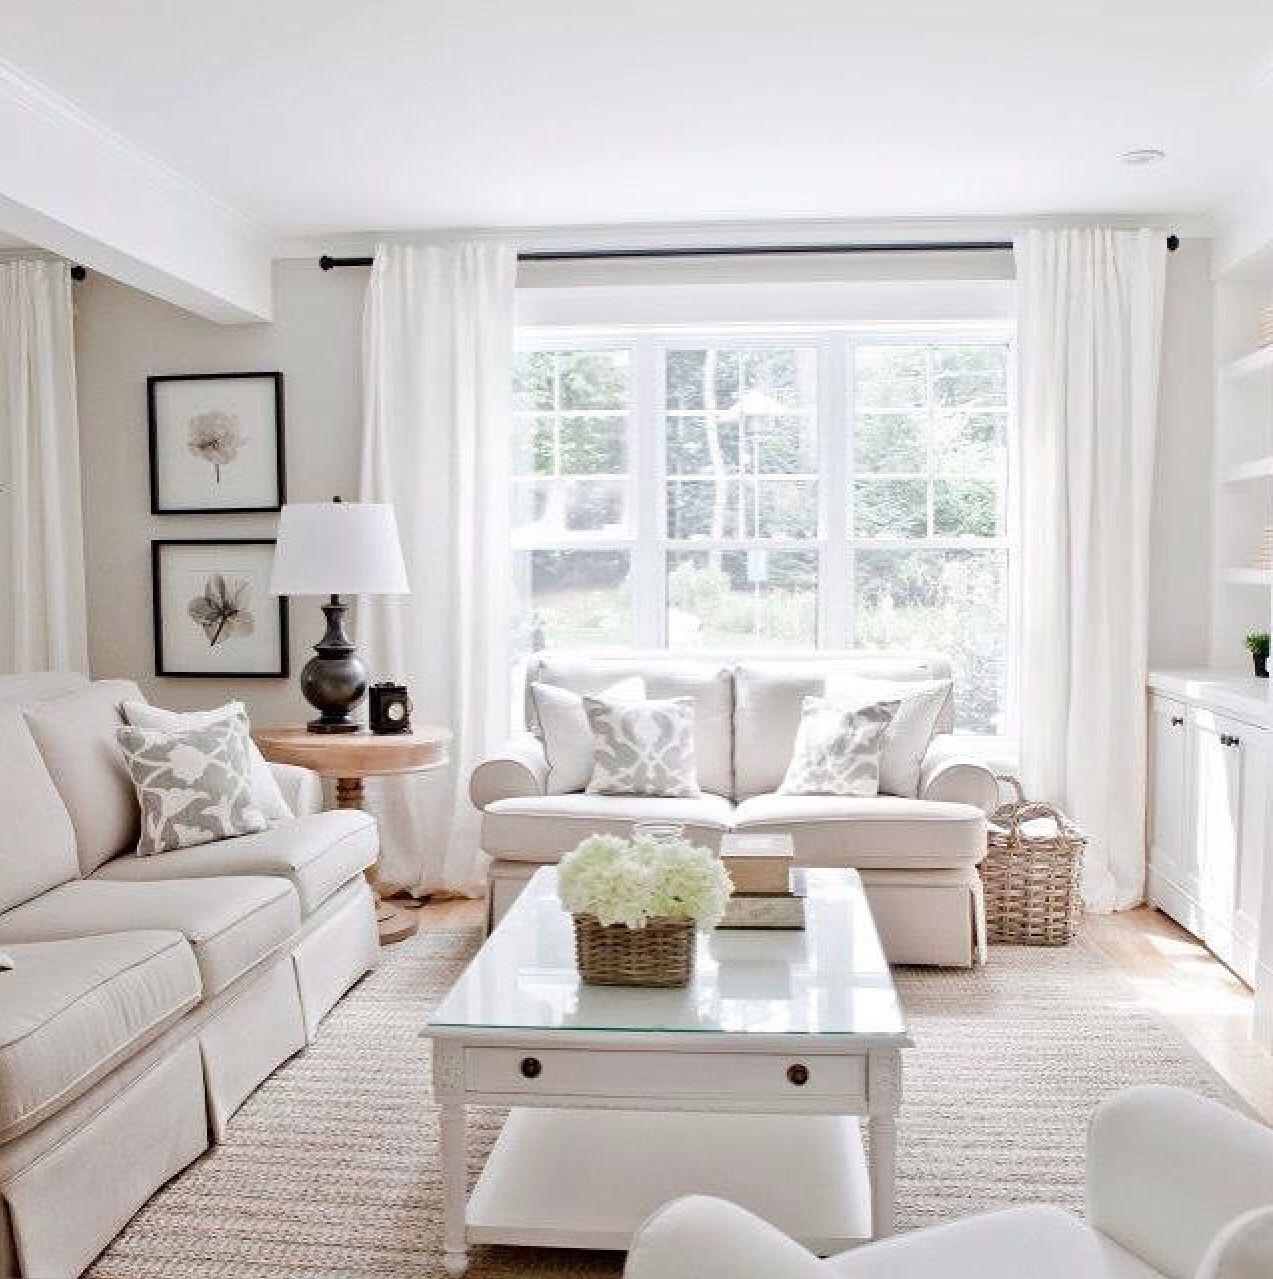 Transitional Design Modern Furnishings White Interior Home Decor